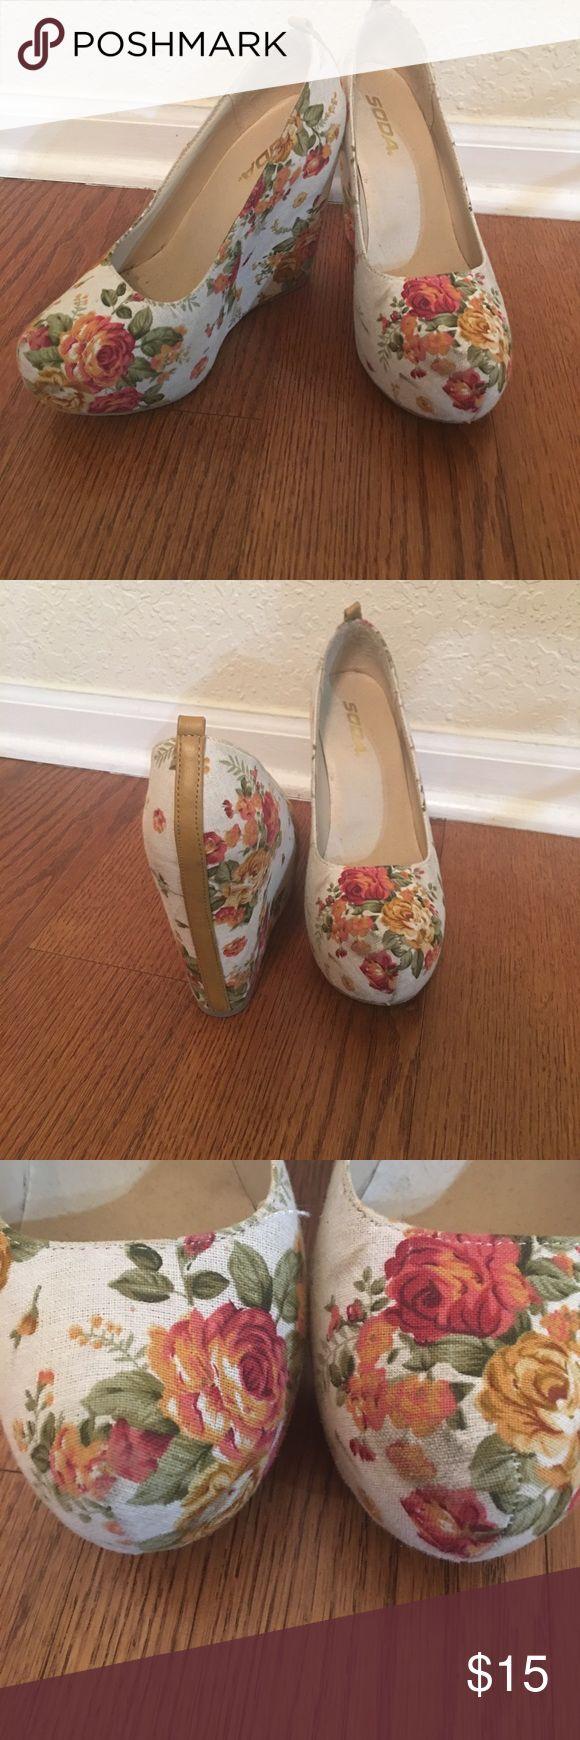 Floral wedges Platform wedges slight scuff on toe. Soda Shoes Wedges